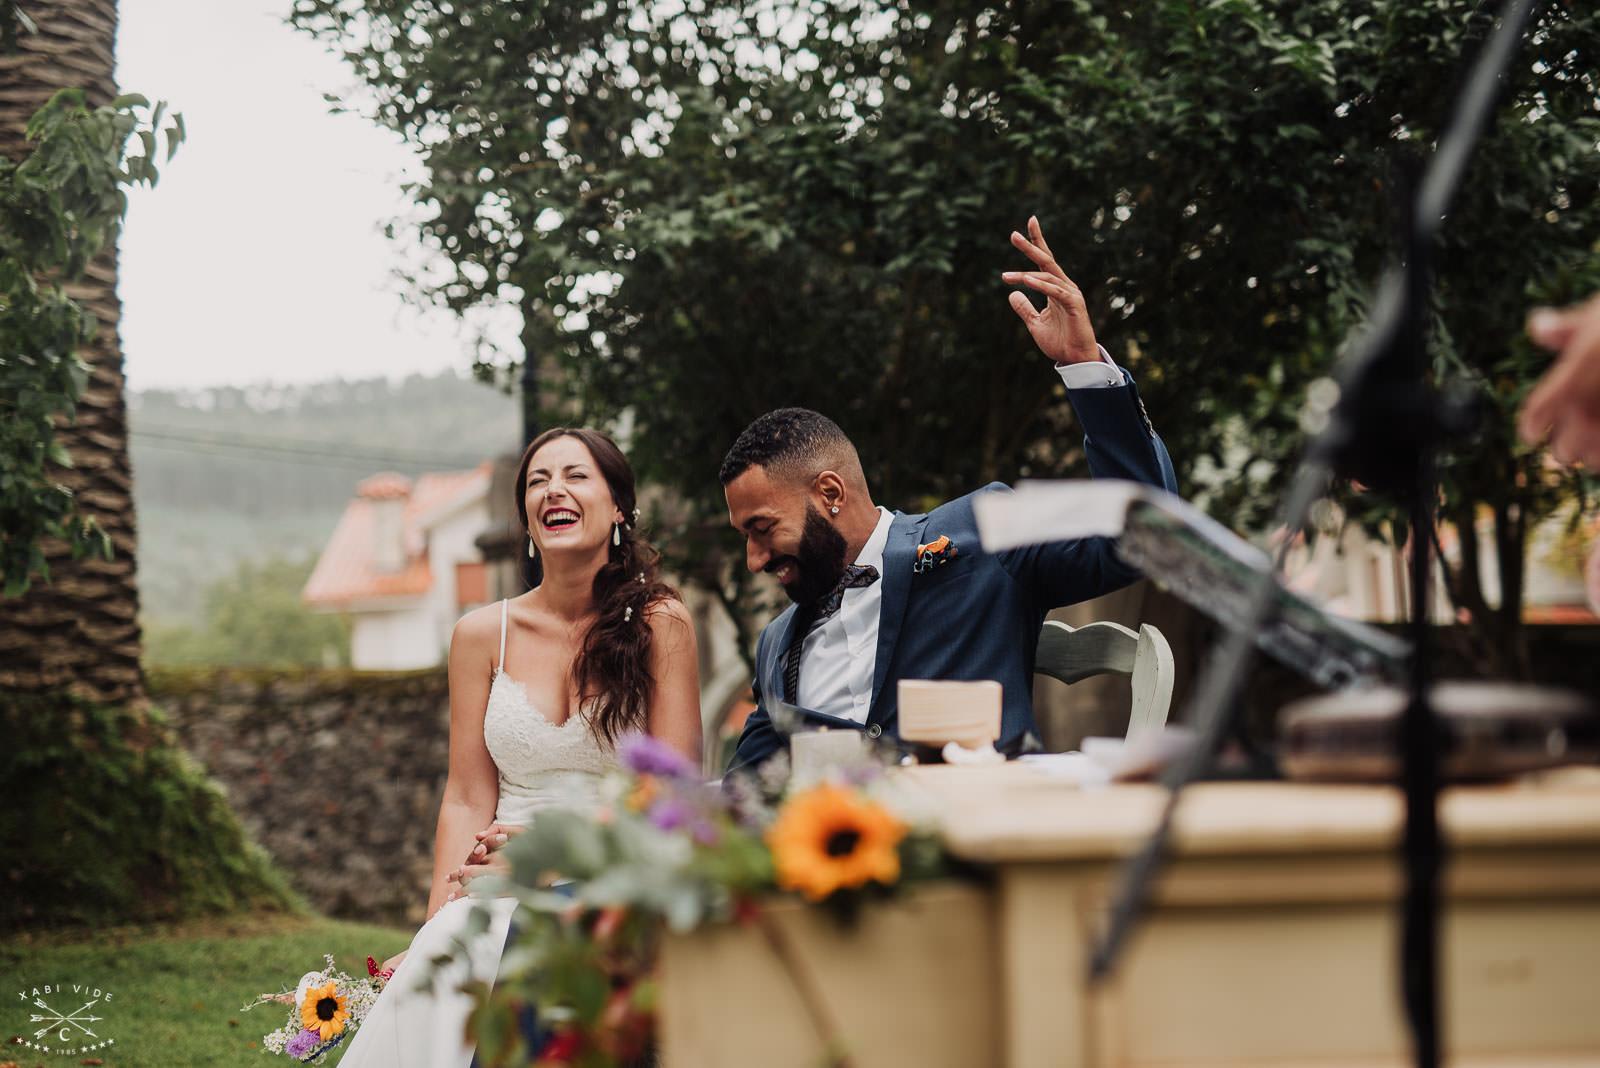 boda en la hosteria de arnuero-120